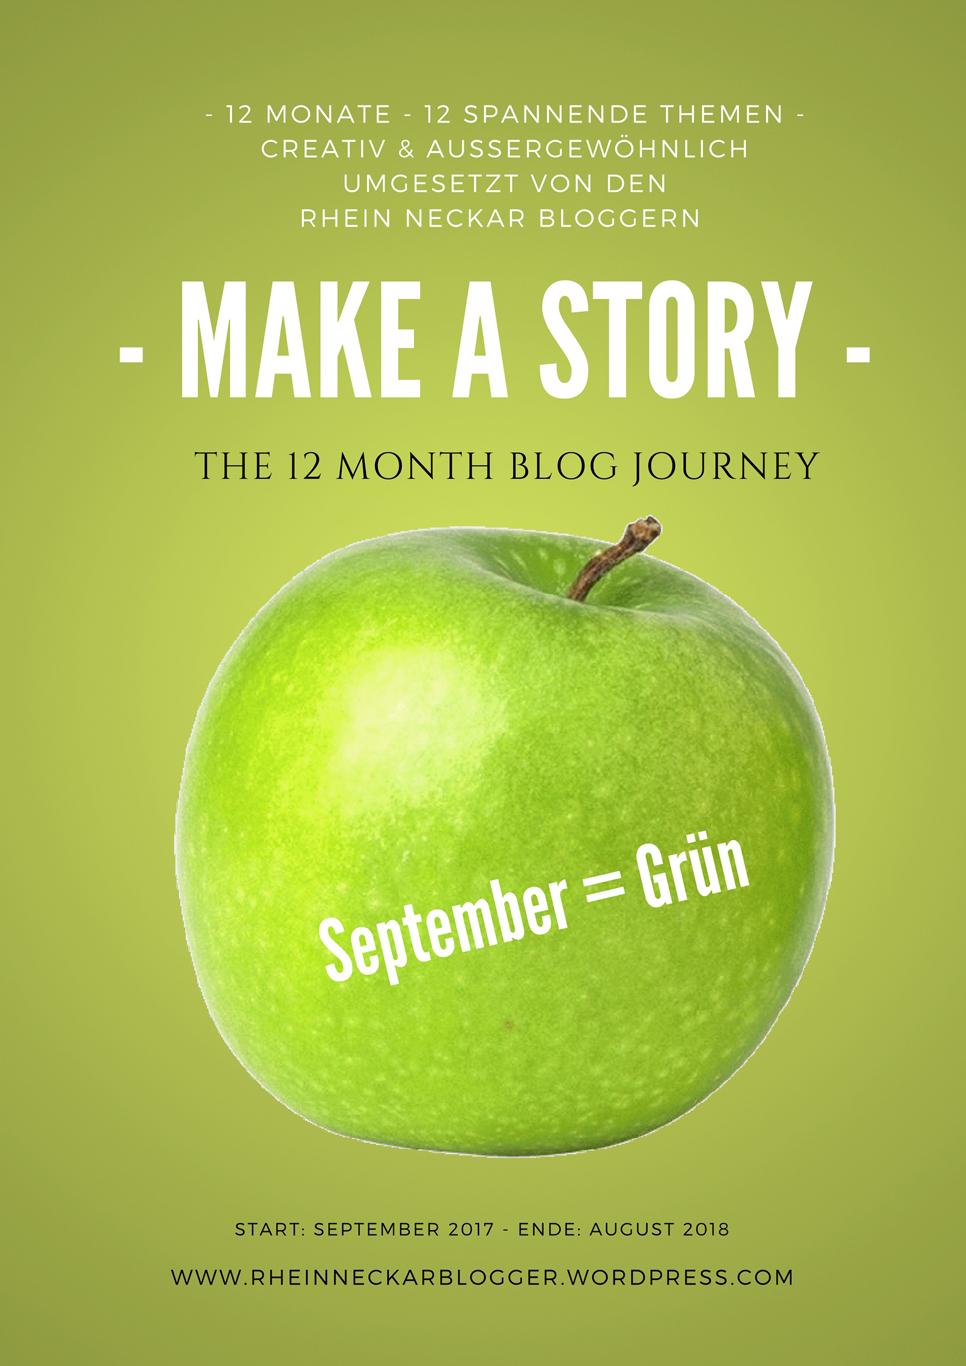 Make a Story - Rhein Neckar Blogger